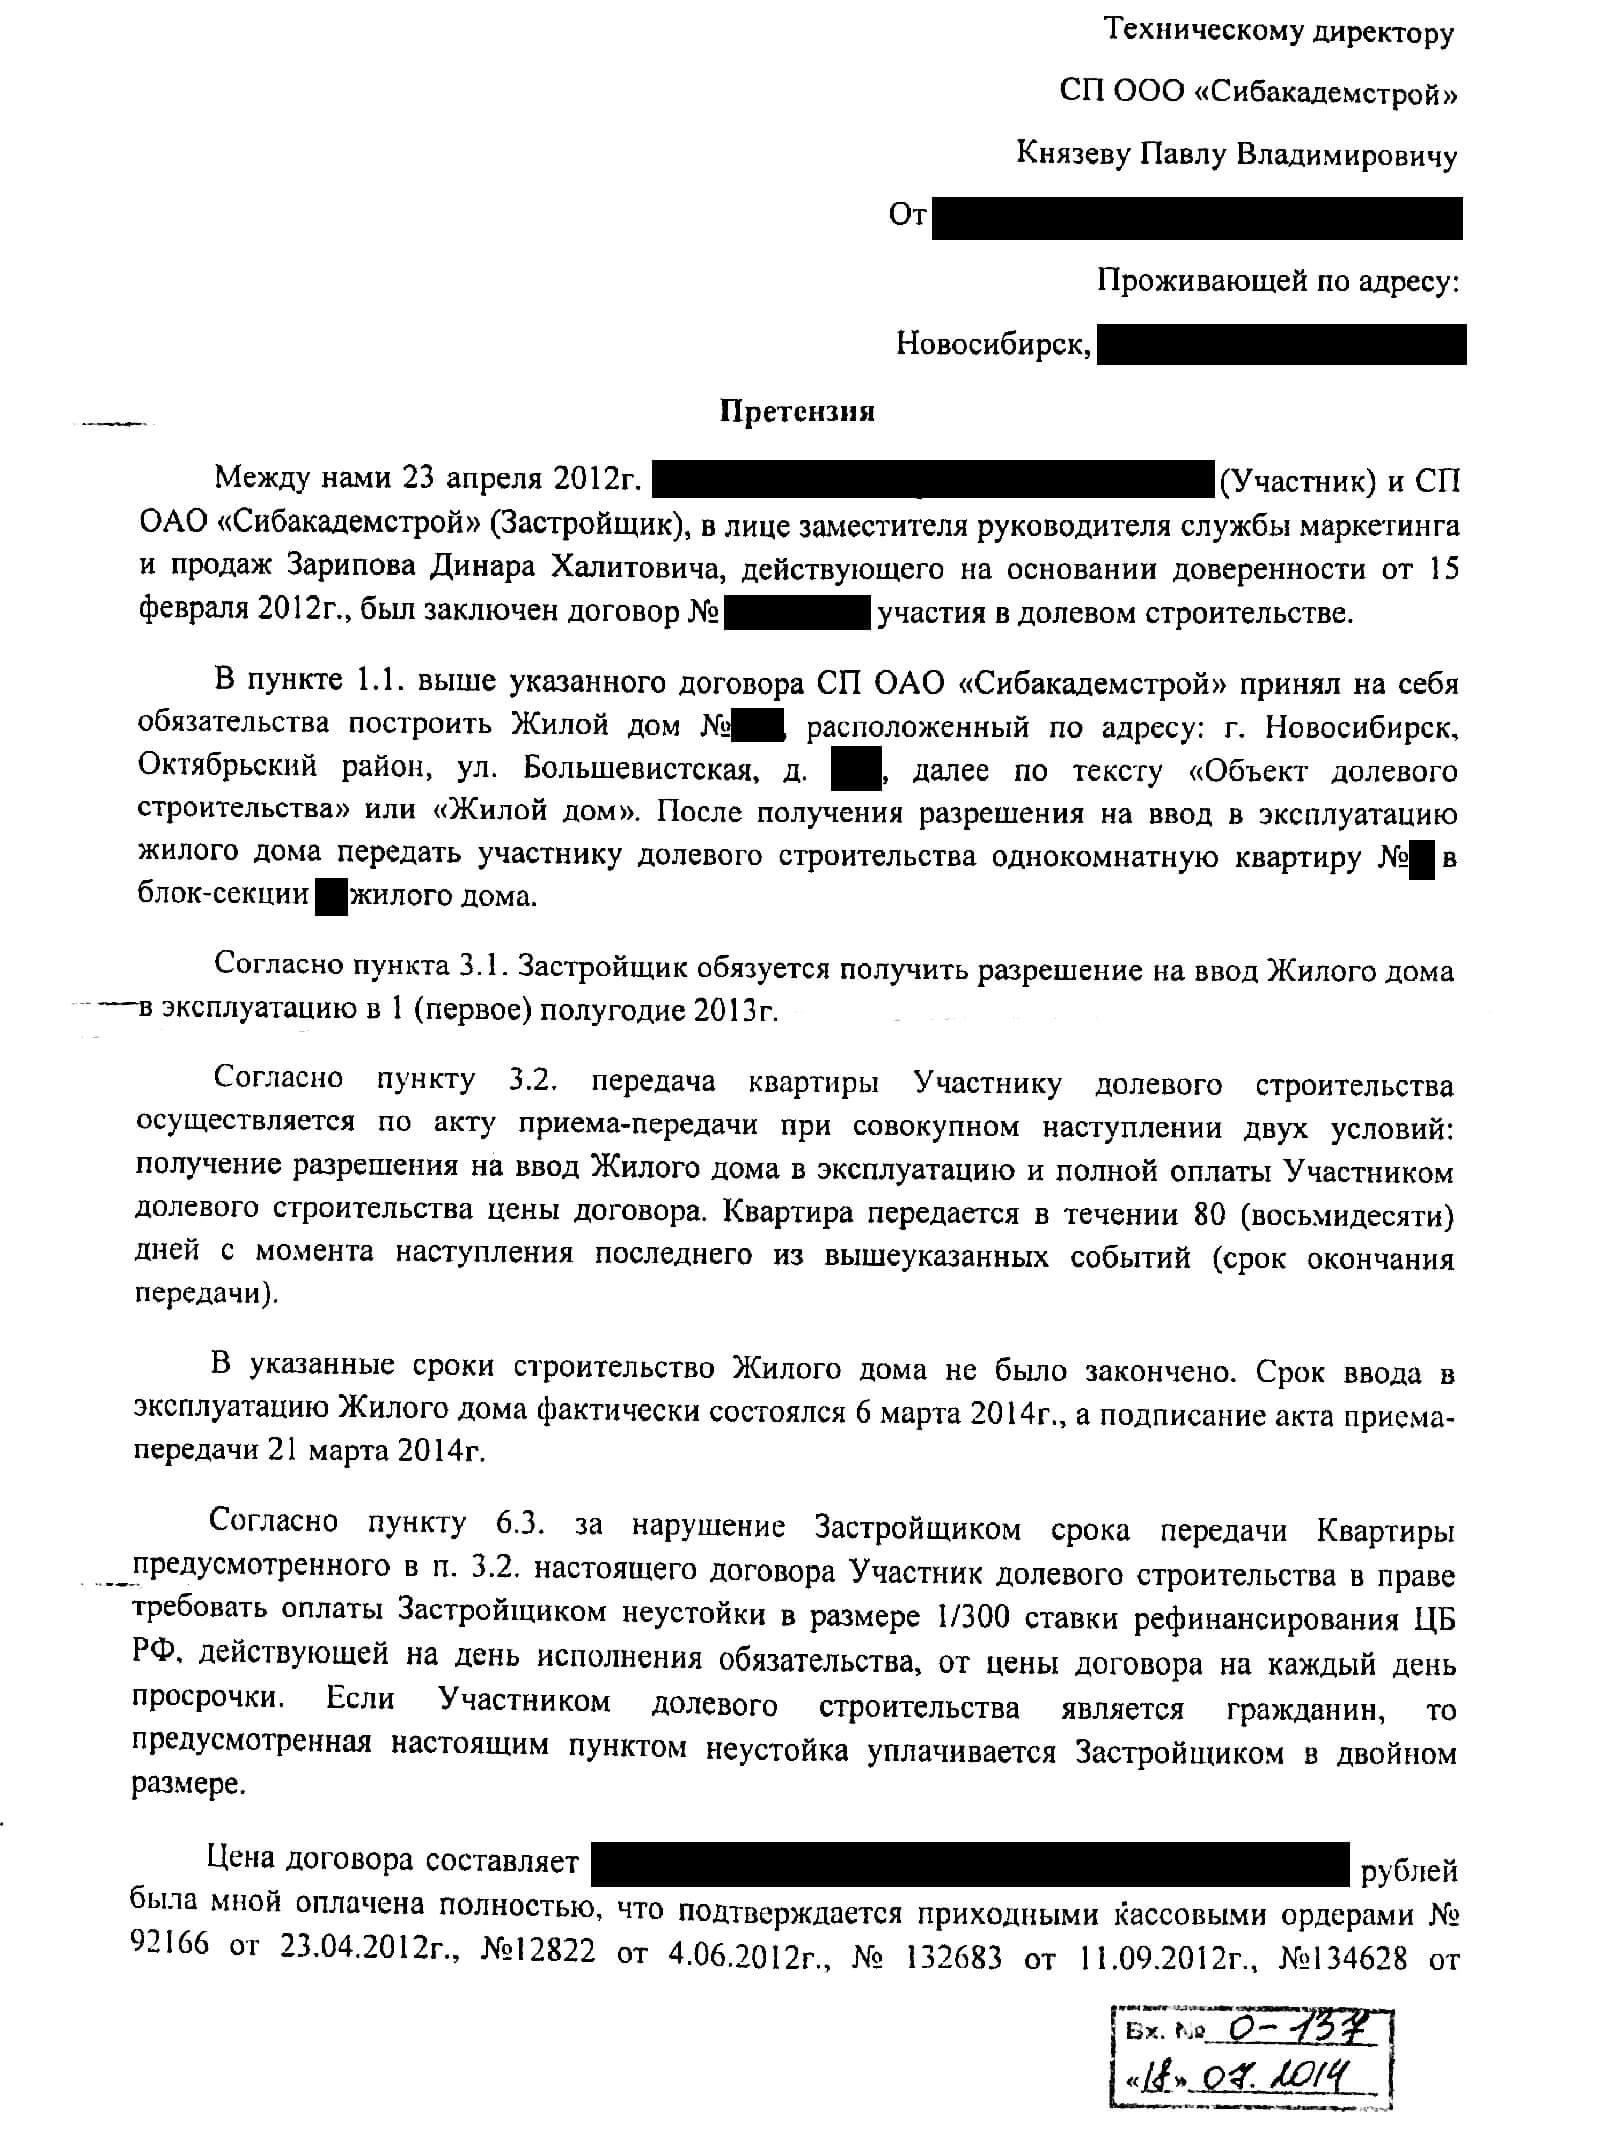 Договор займа Образец - бланк - форма Бланкер. ру